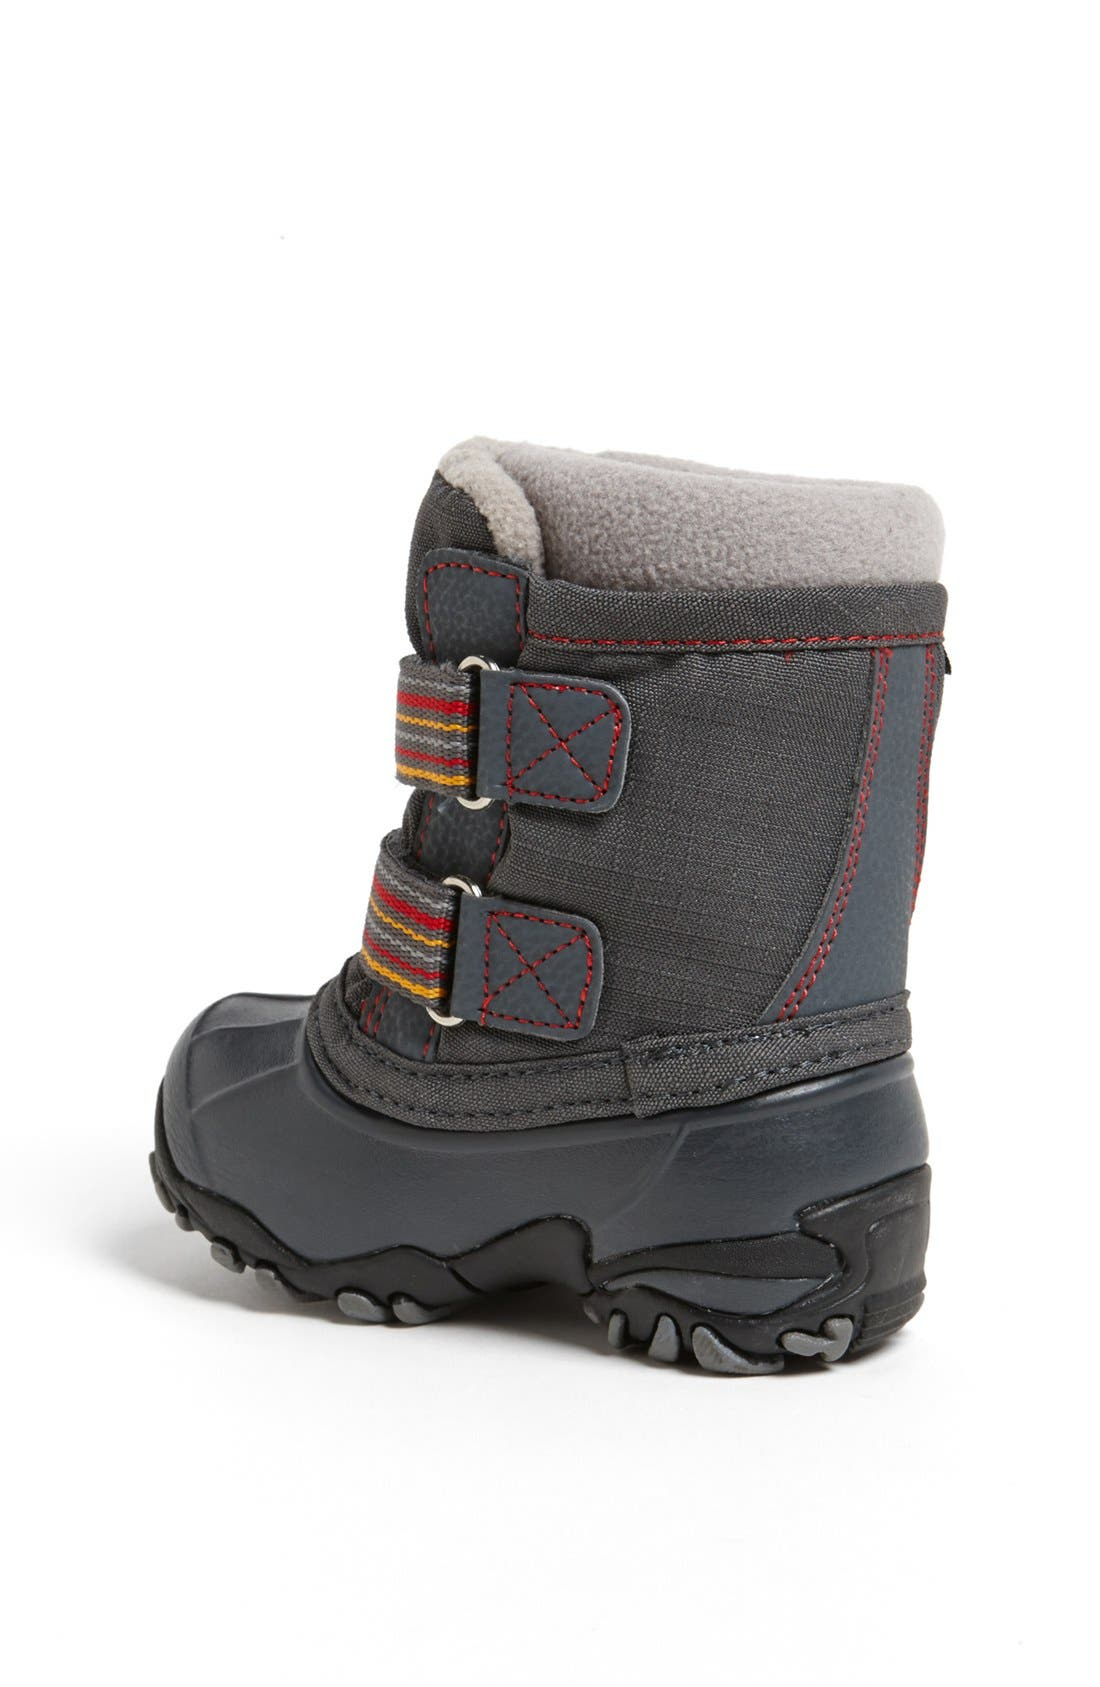 Alternate Image 2  - Acton 'Lullaby' Waterproof Winter Boot (Walker & Toddler)